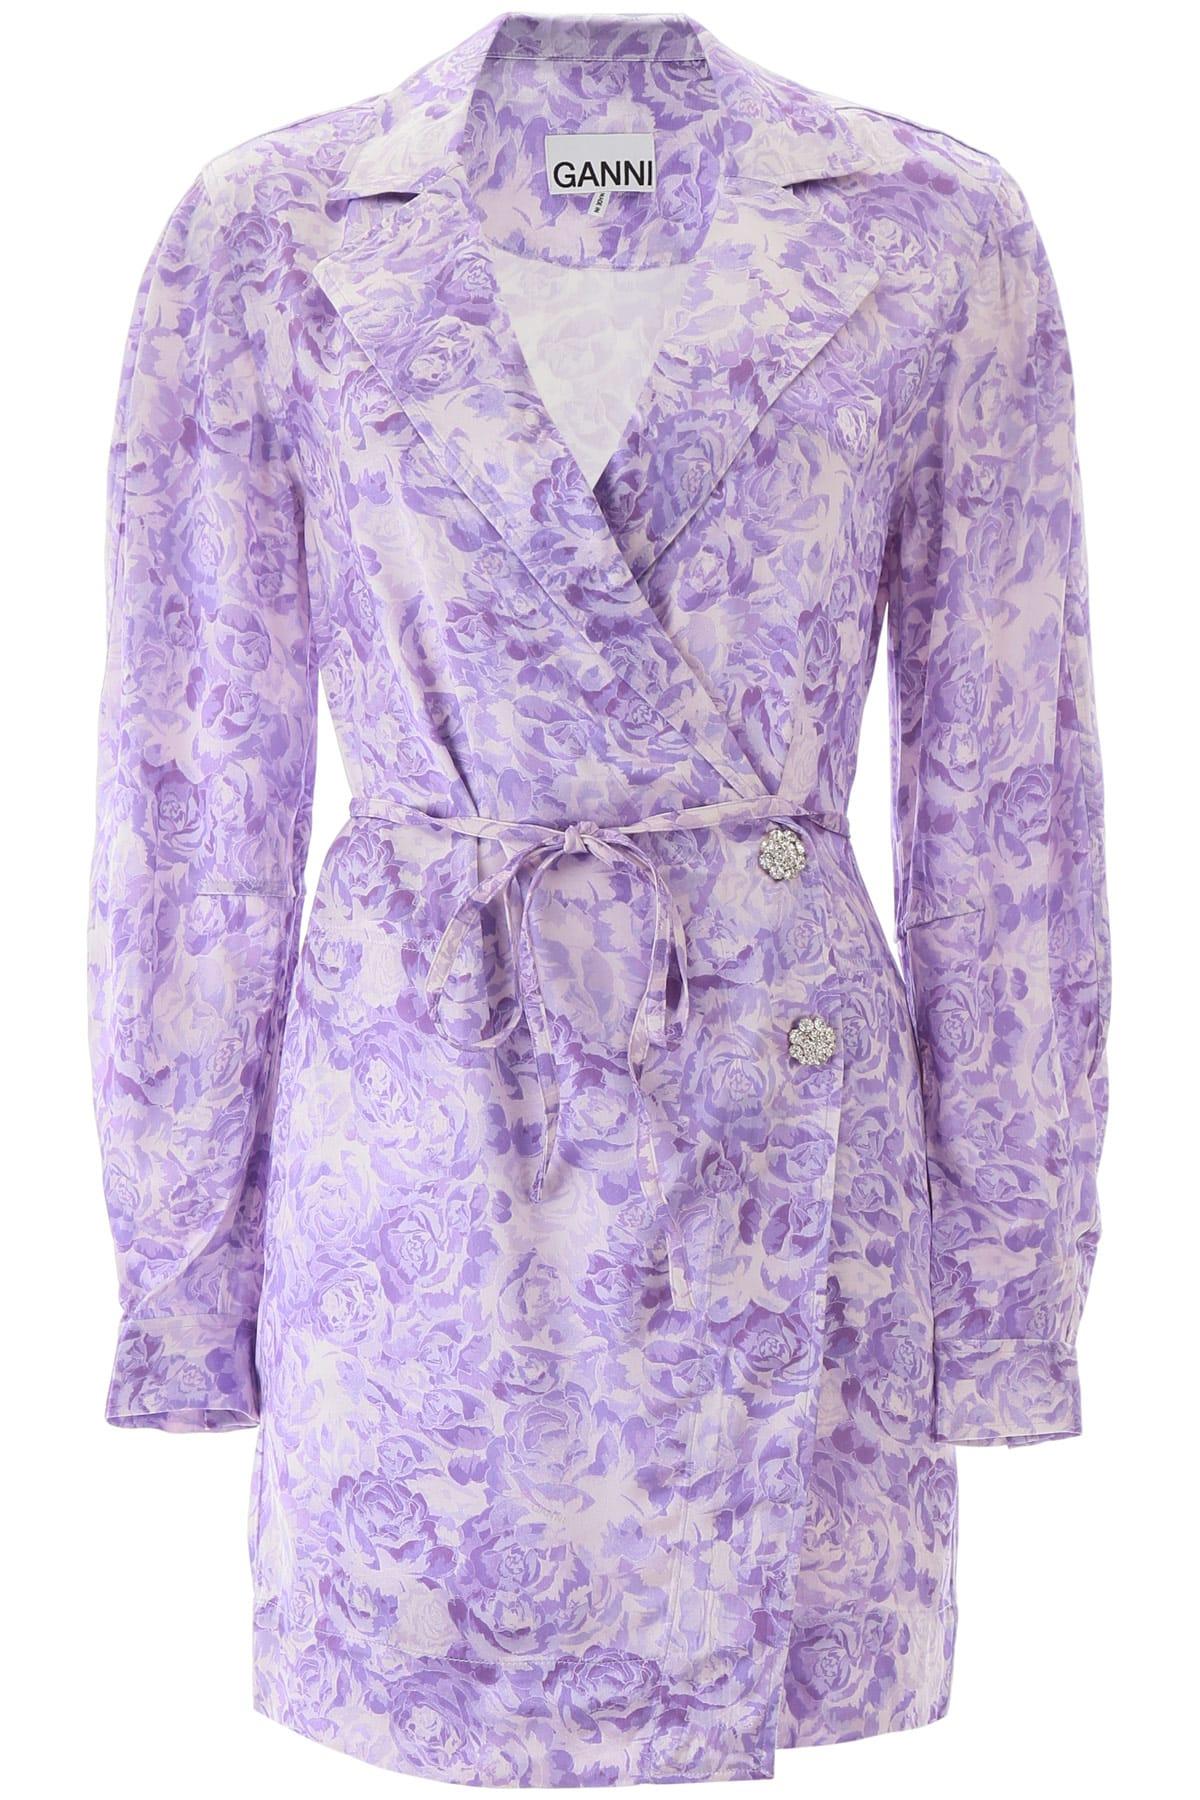 Buy Ganni Floral Print Mini Dress online, shop Ganni with free shipping